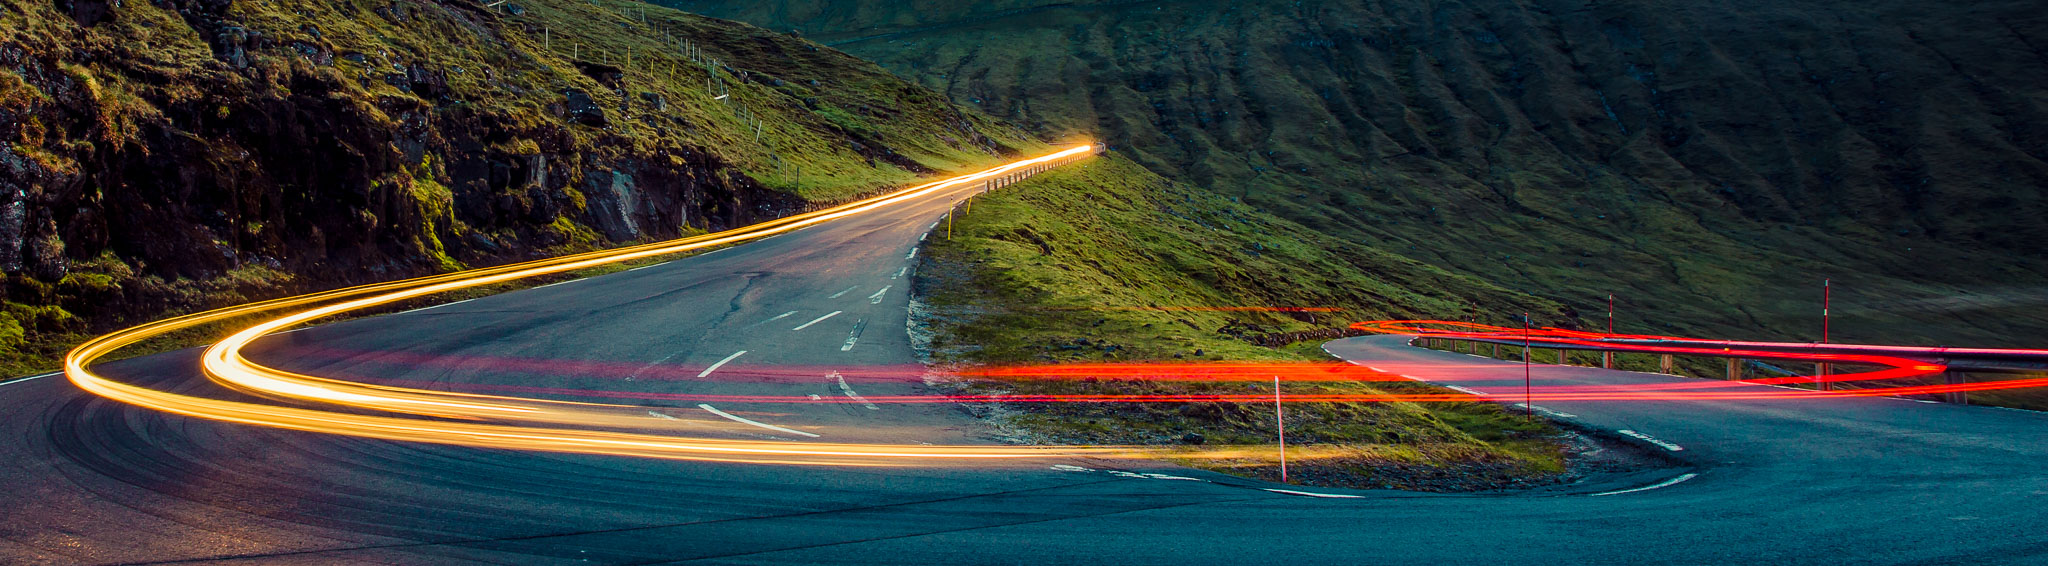 Funingur at midnight, Faroe